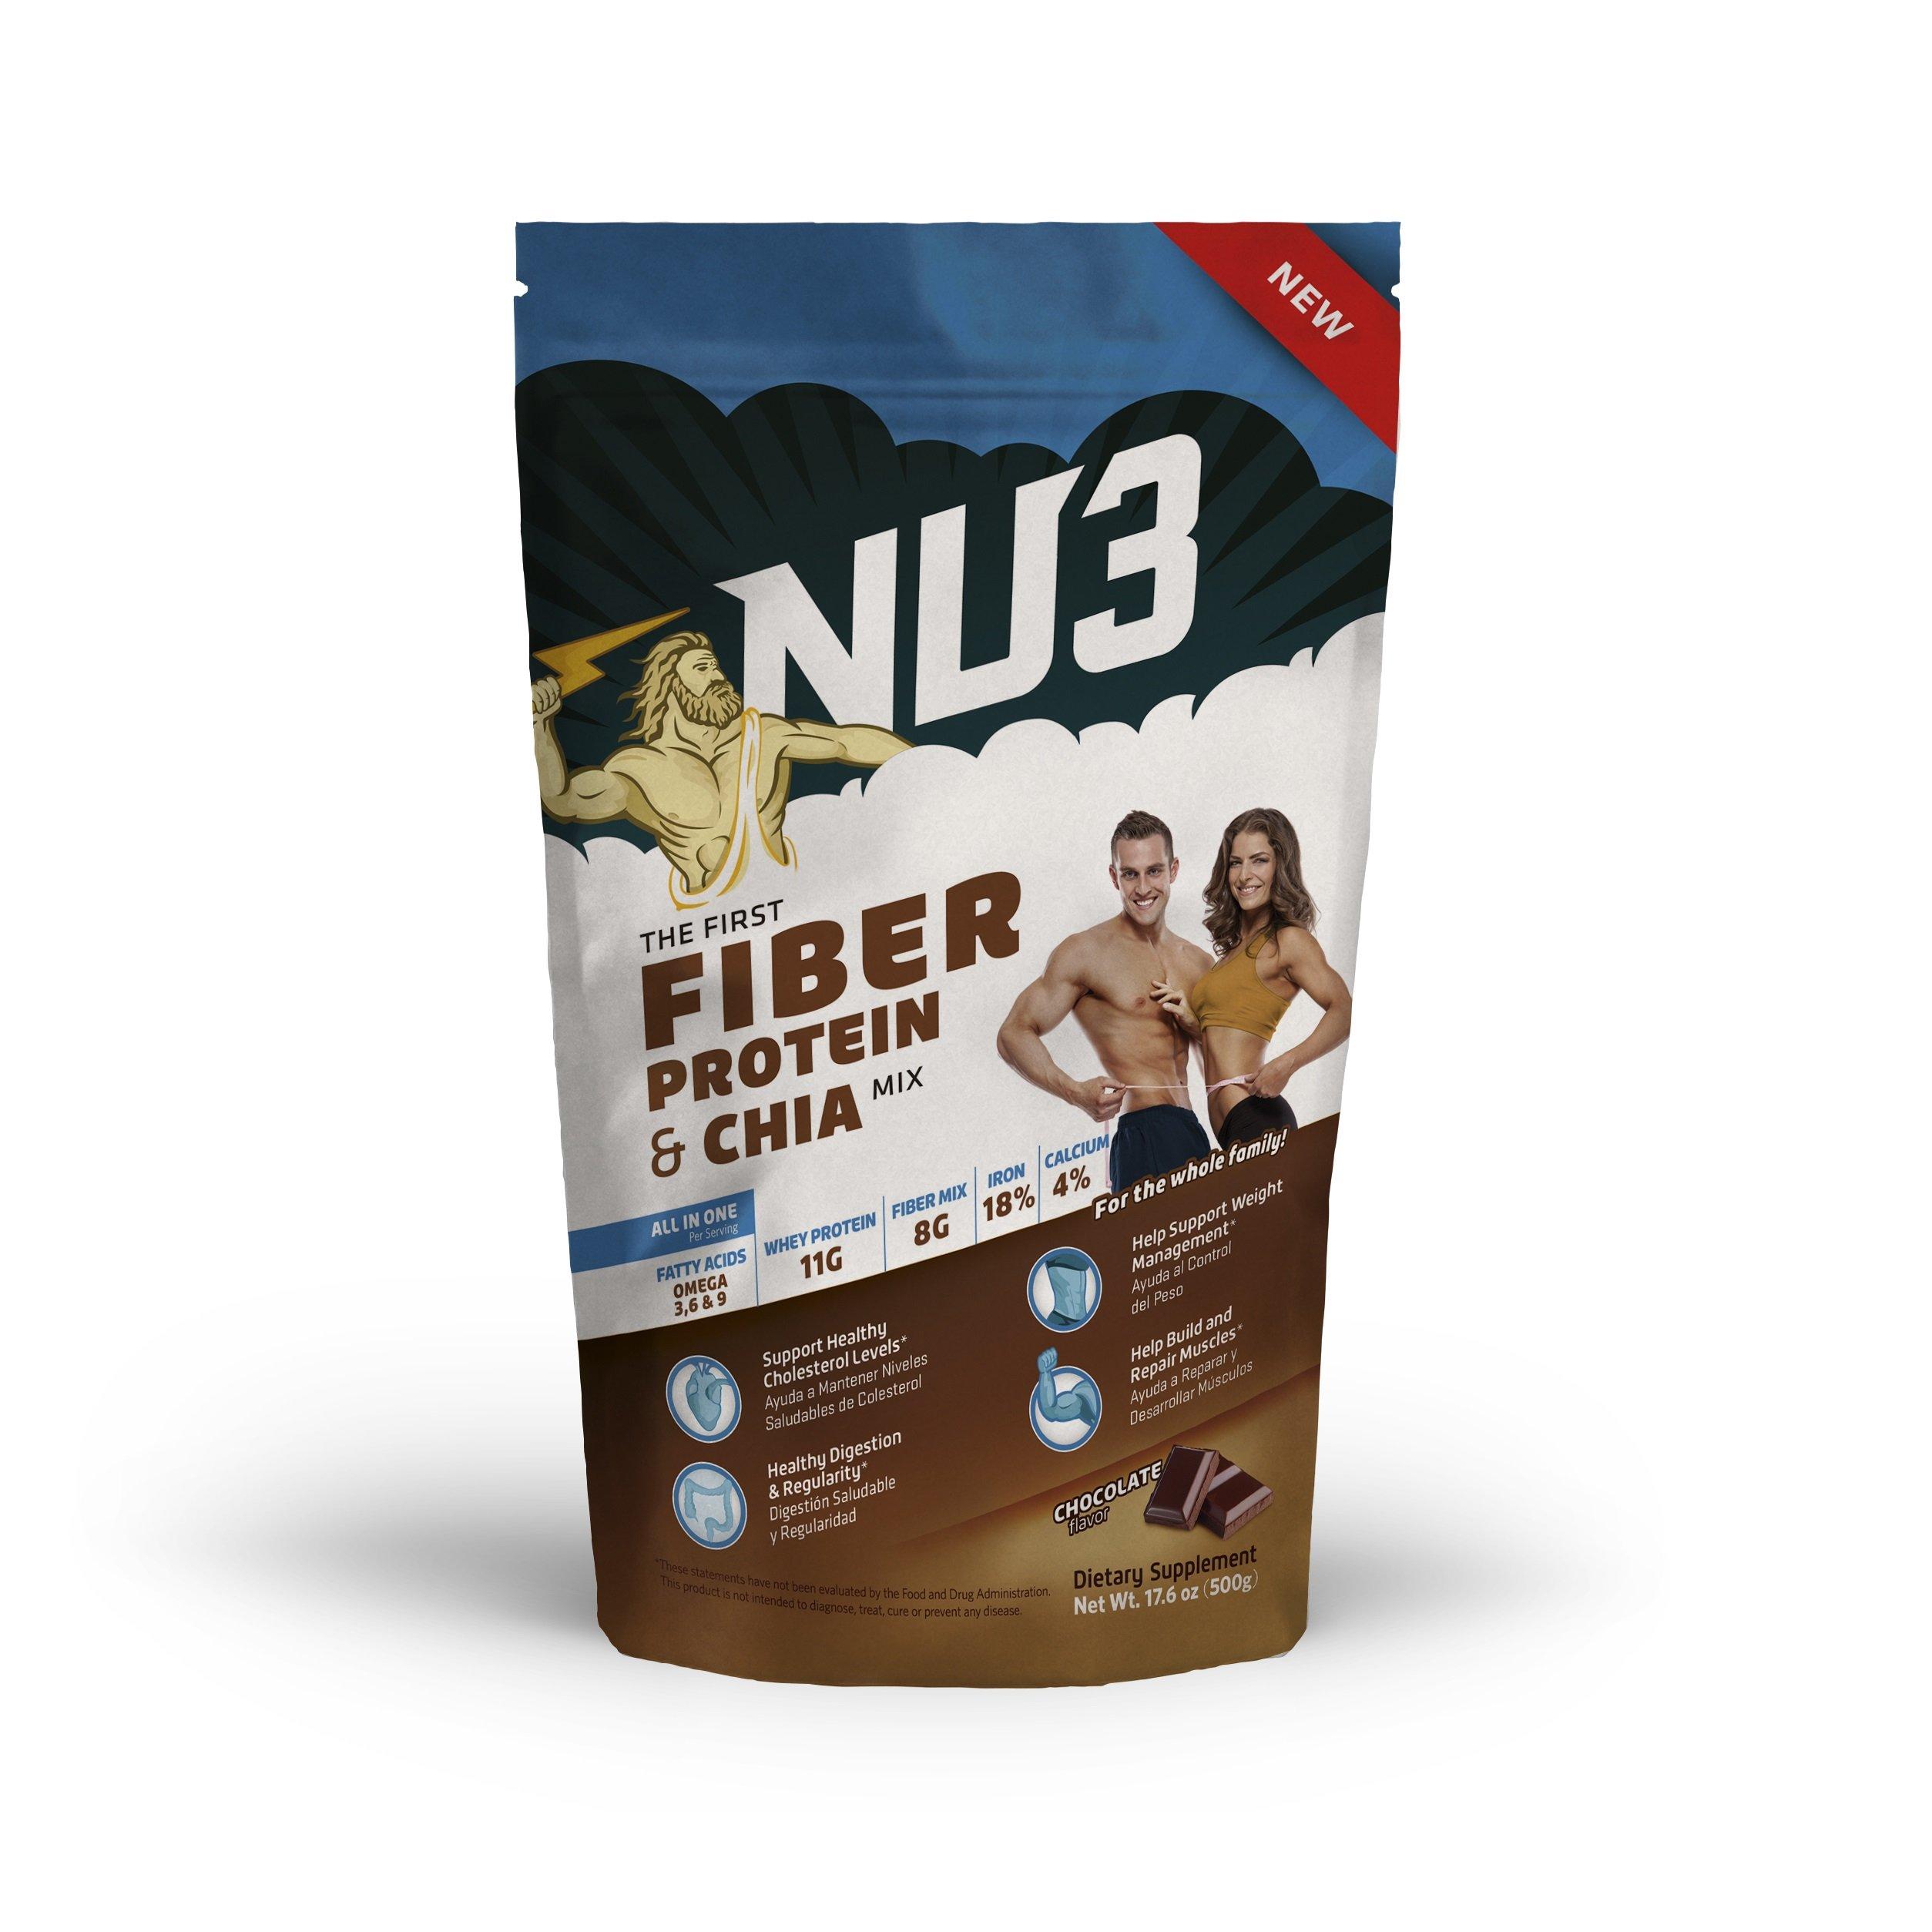 NU3 Fiber, Protein & Chia - Chocolate - 17.60 Ounce